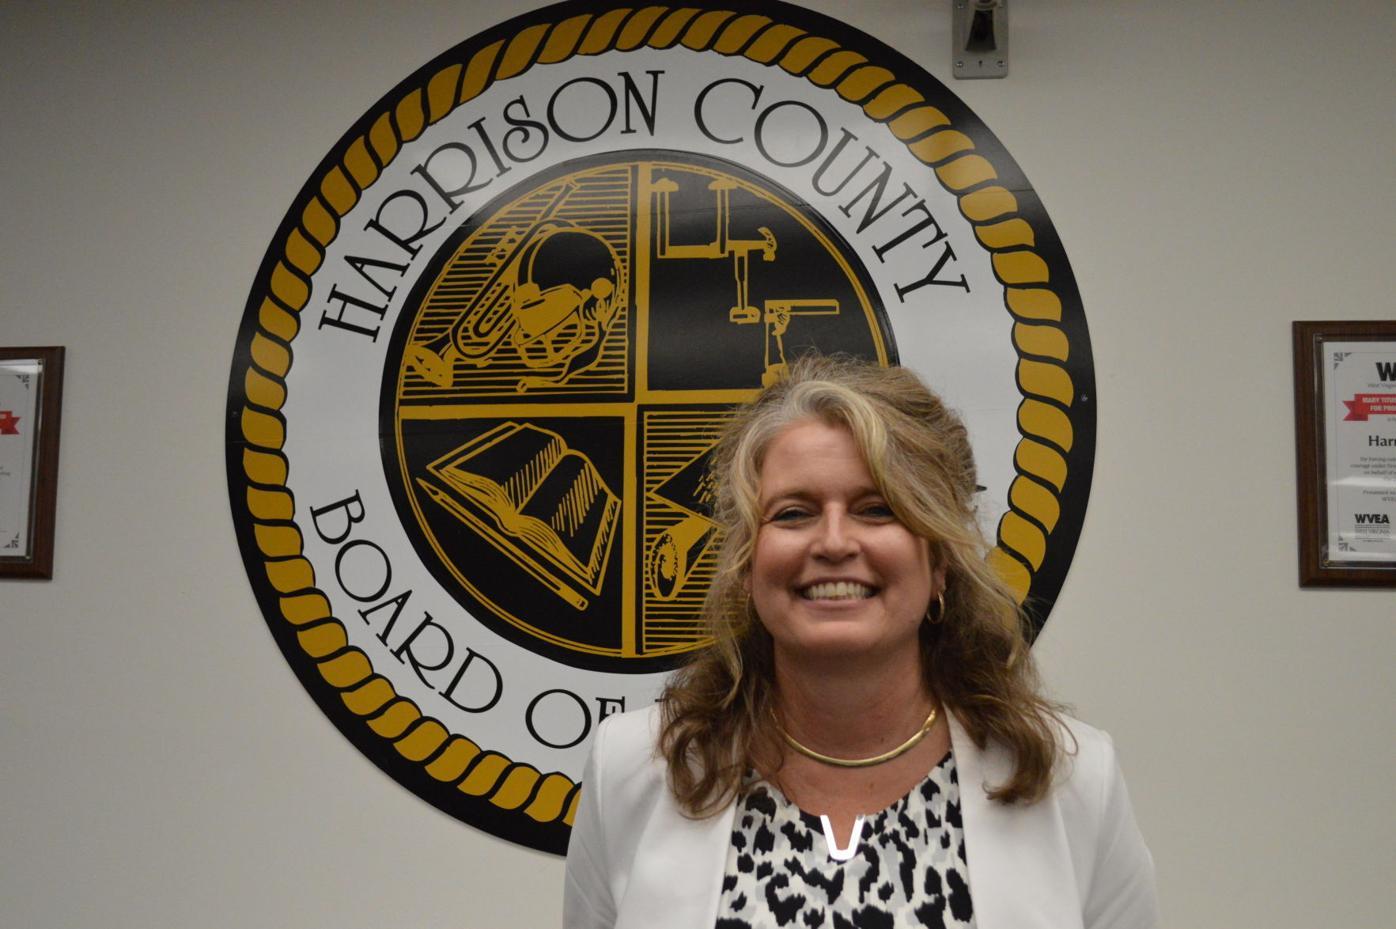 Superintendent Dora Stutler